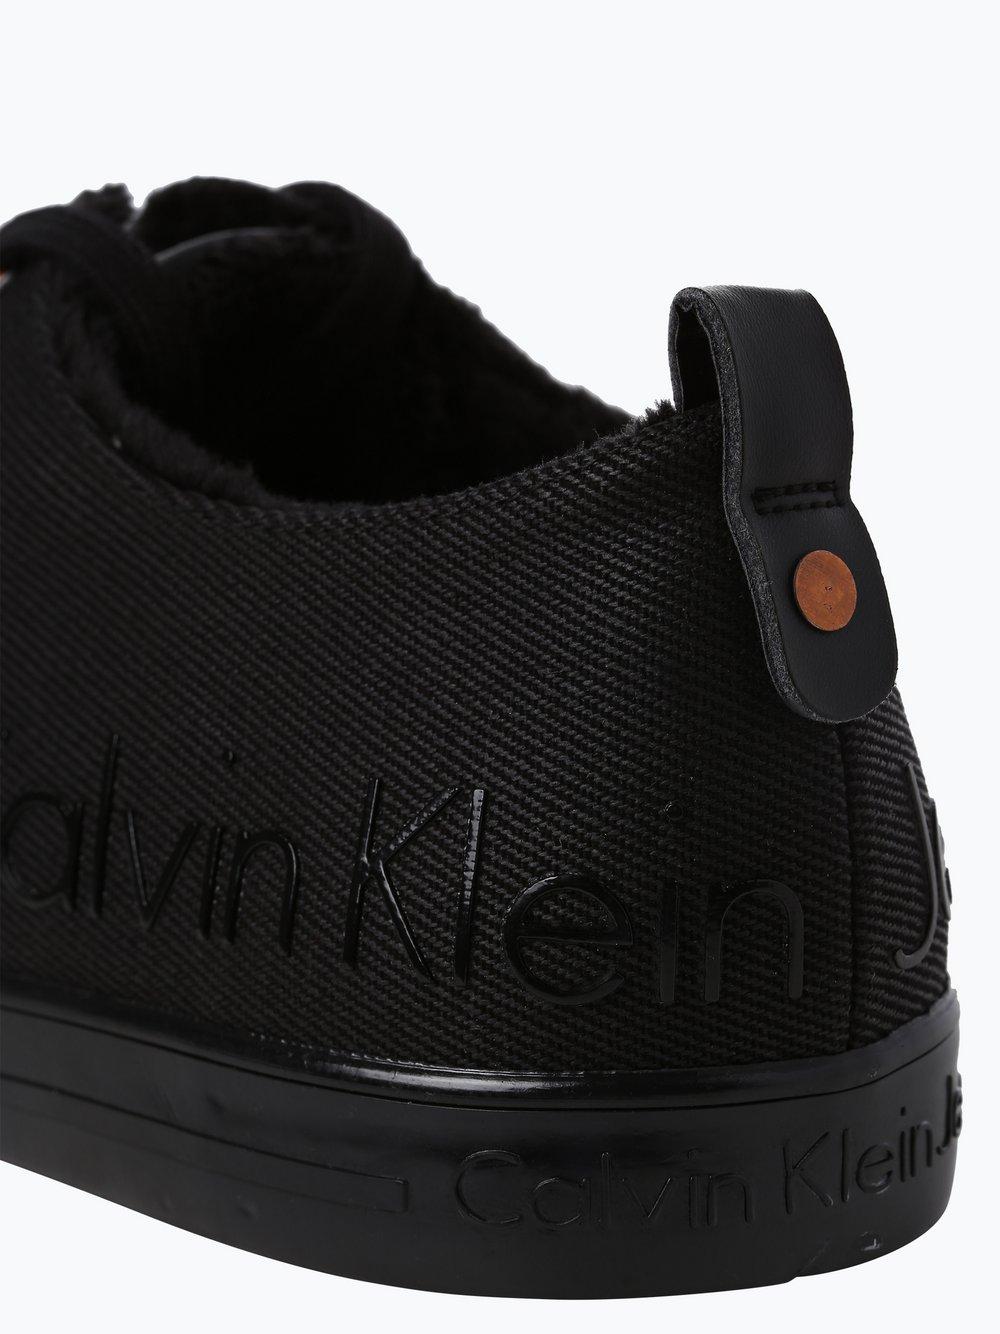 Calvin Klein UNI Sneaker high Damen black Sneaker high